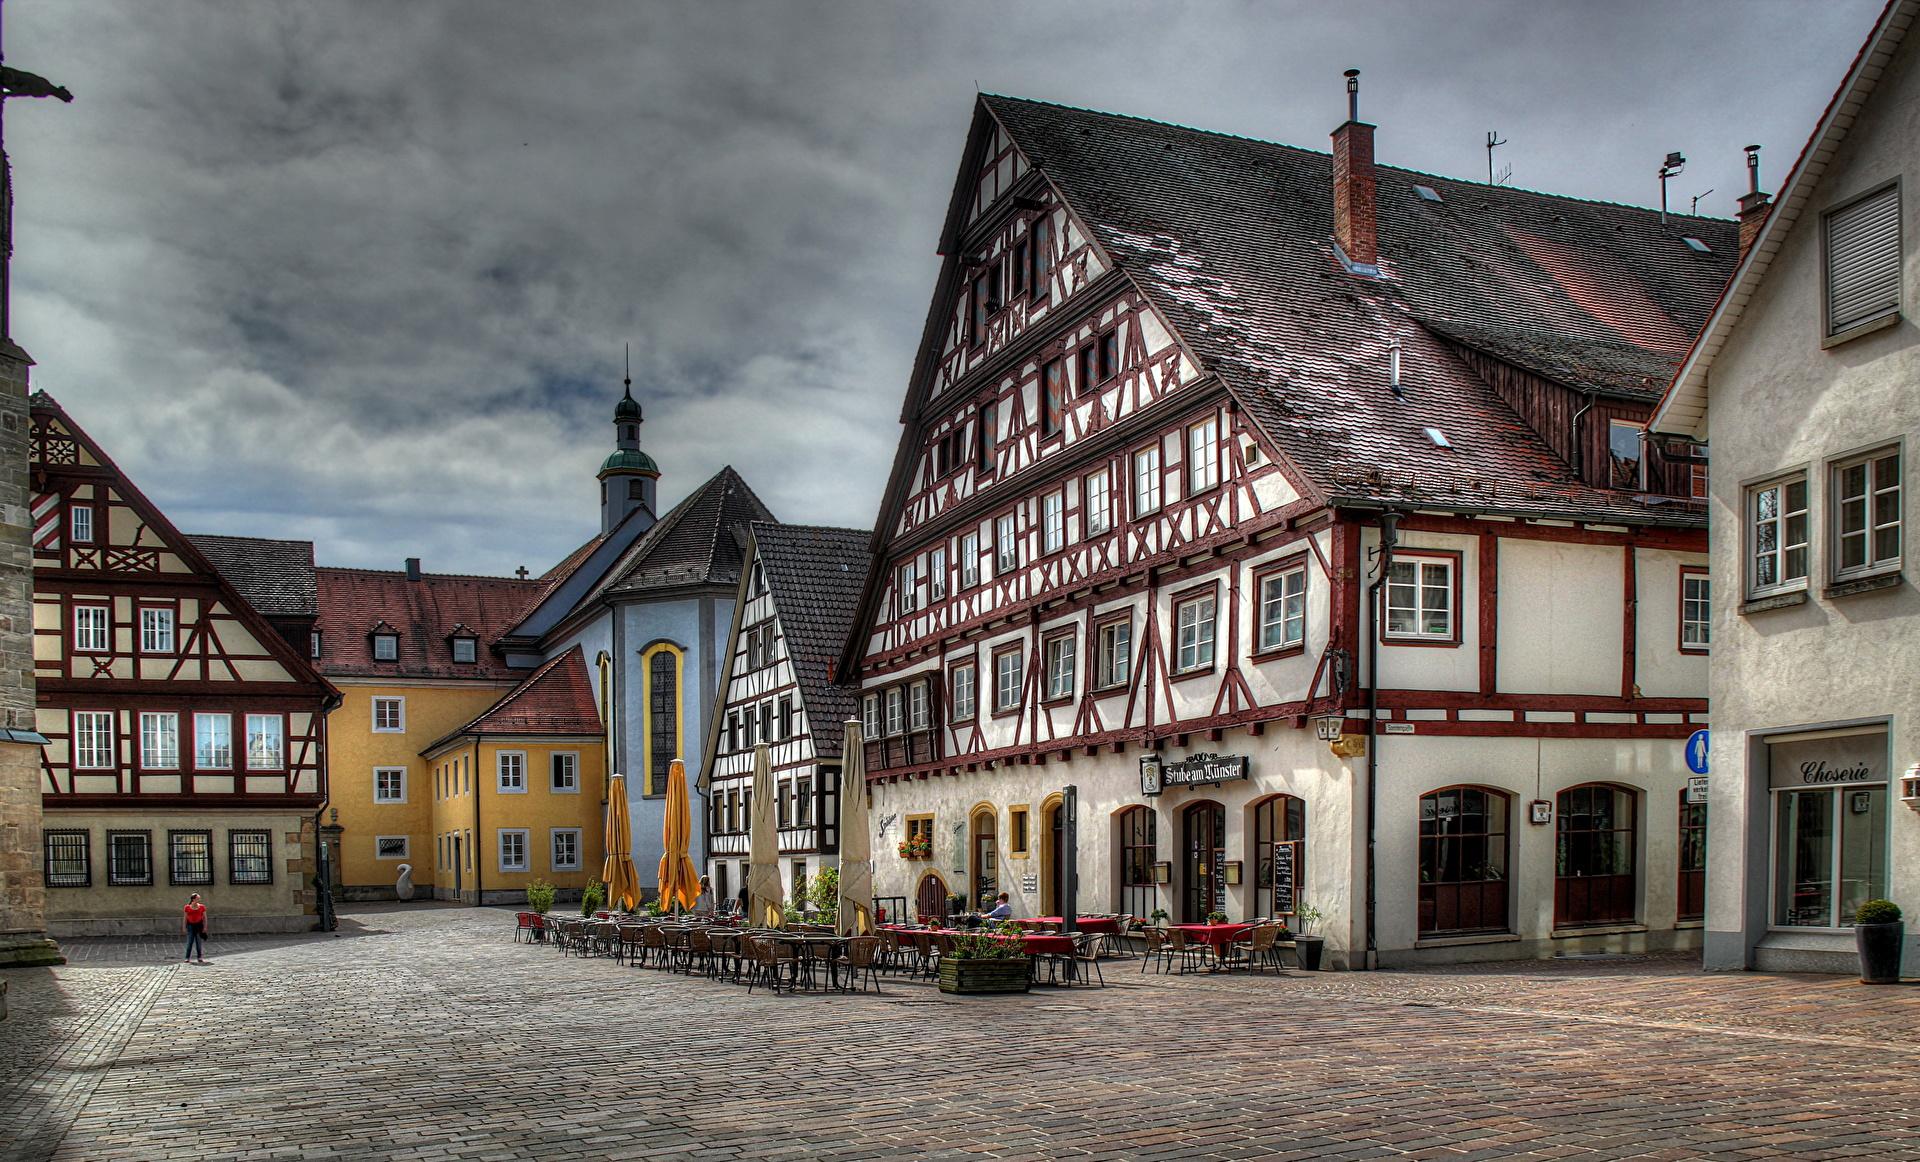 Freudenberg, Germany скачать